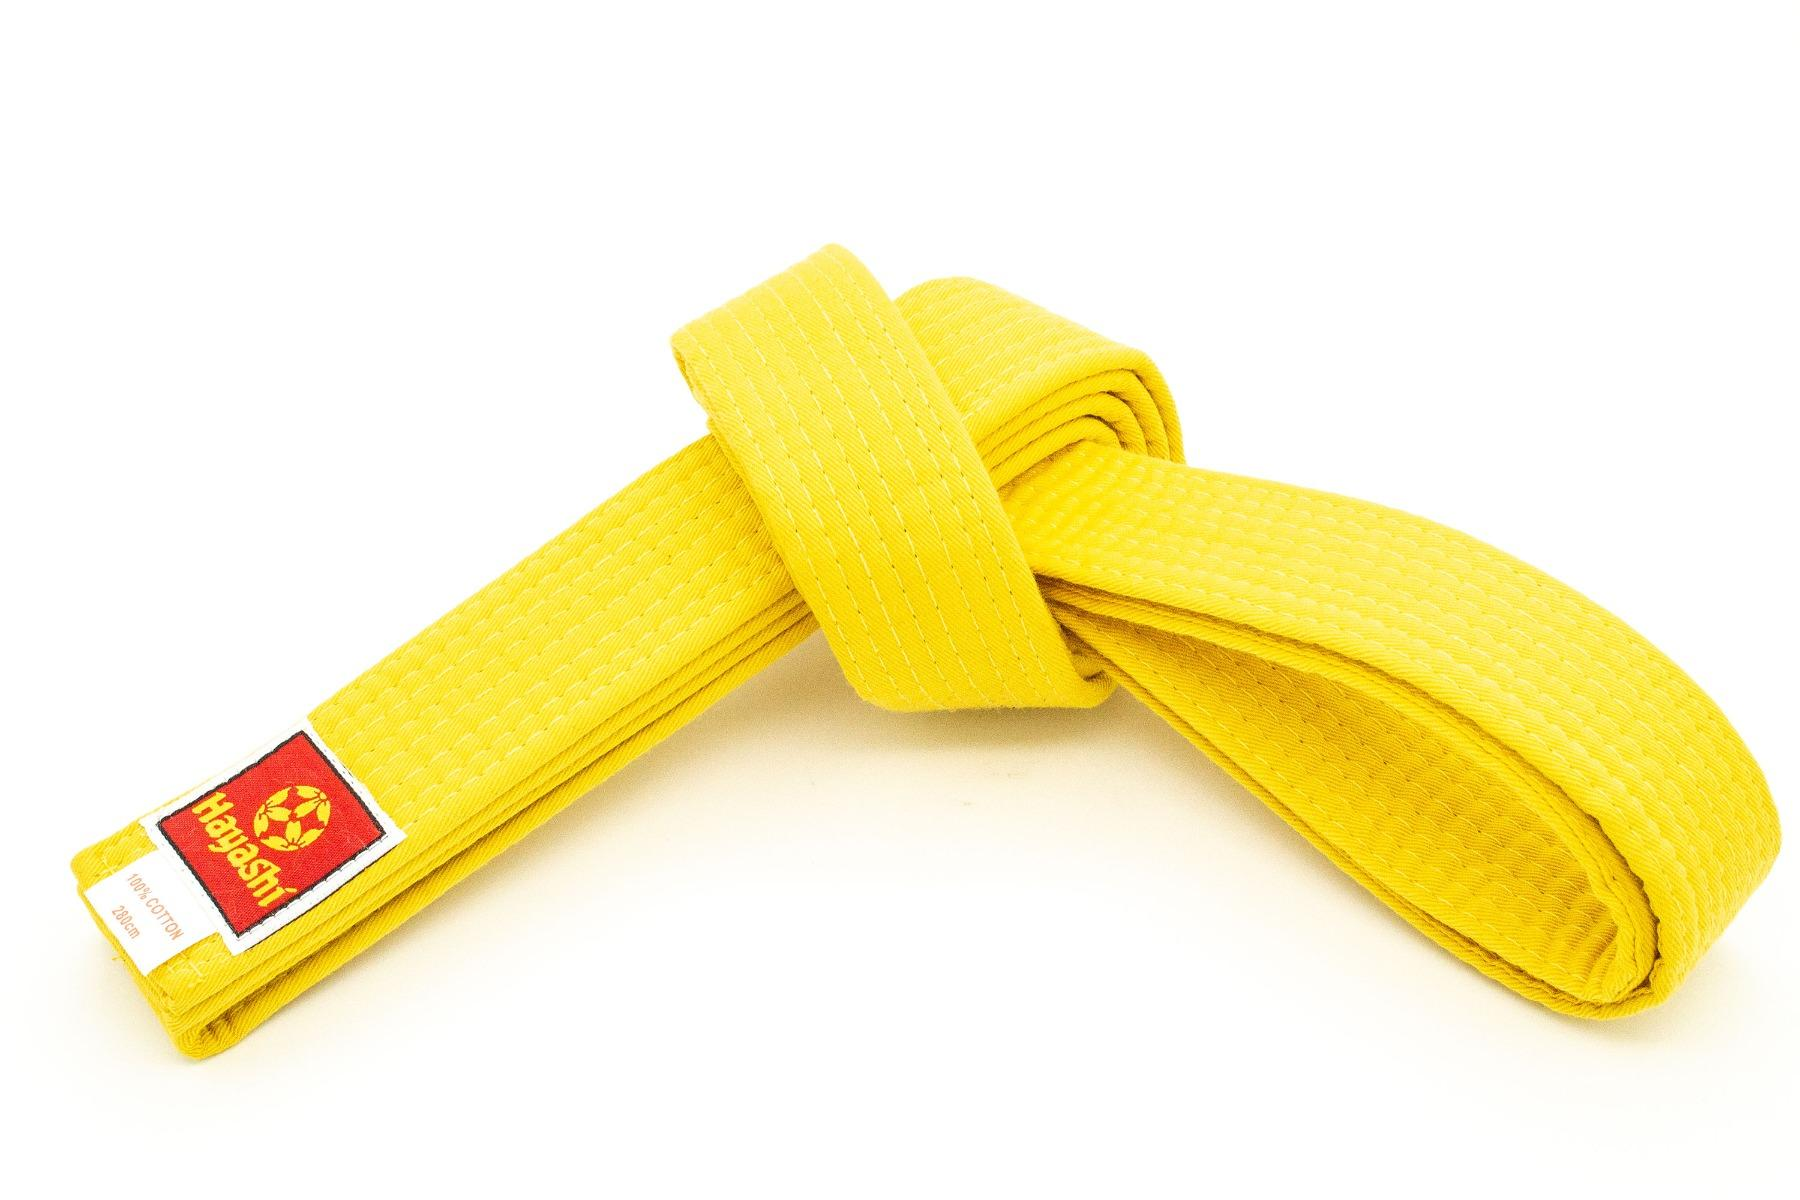 280cm Hayashi Budogürtel zweifarbig ORANGE GELB Judo Karate Taekwondo Ju Jutsu